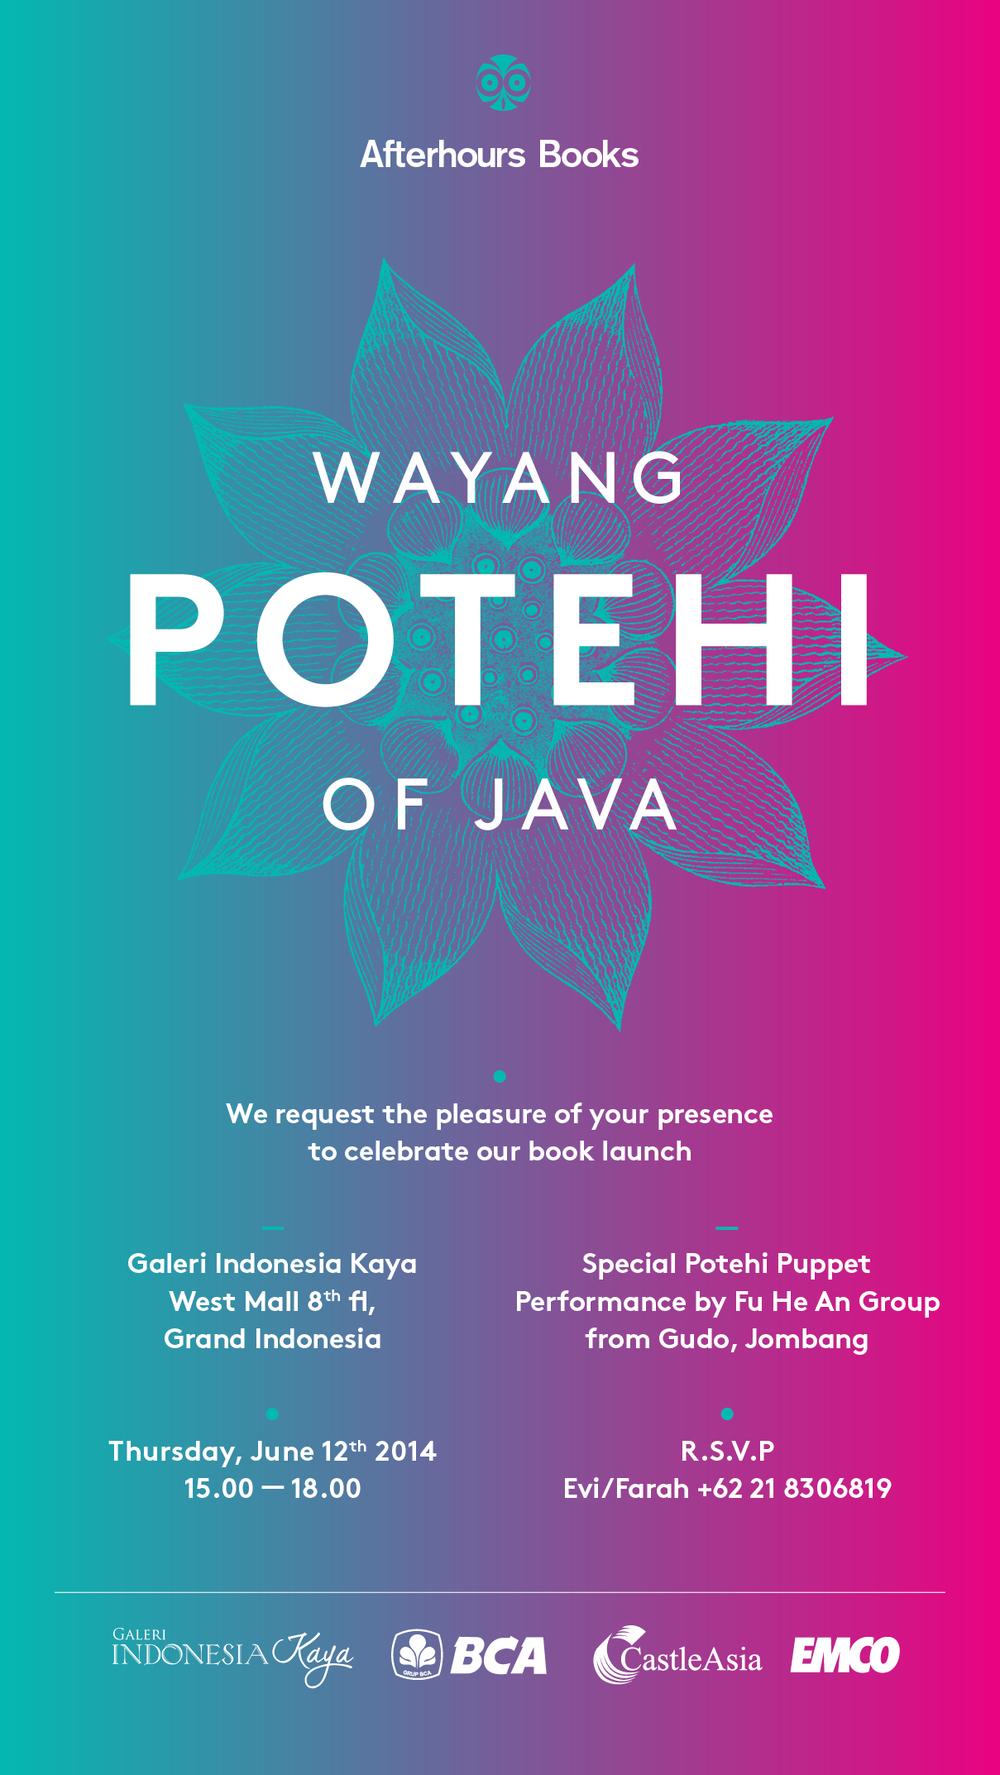 Wayang Potehi Of Java Book Launch Invitation Afterhours Books